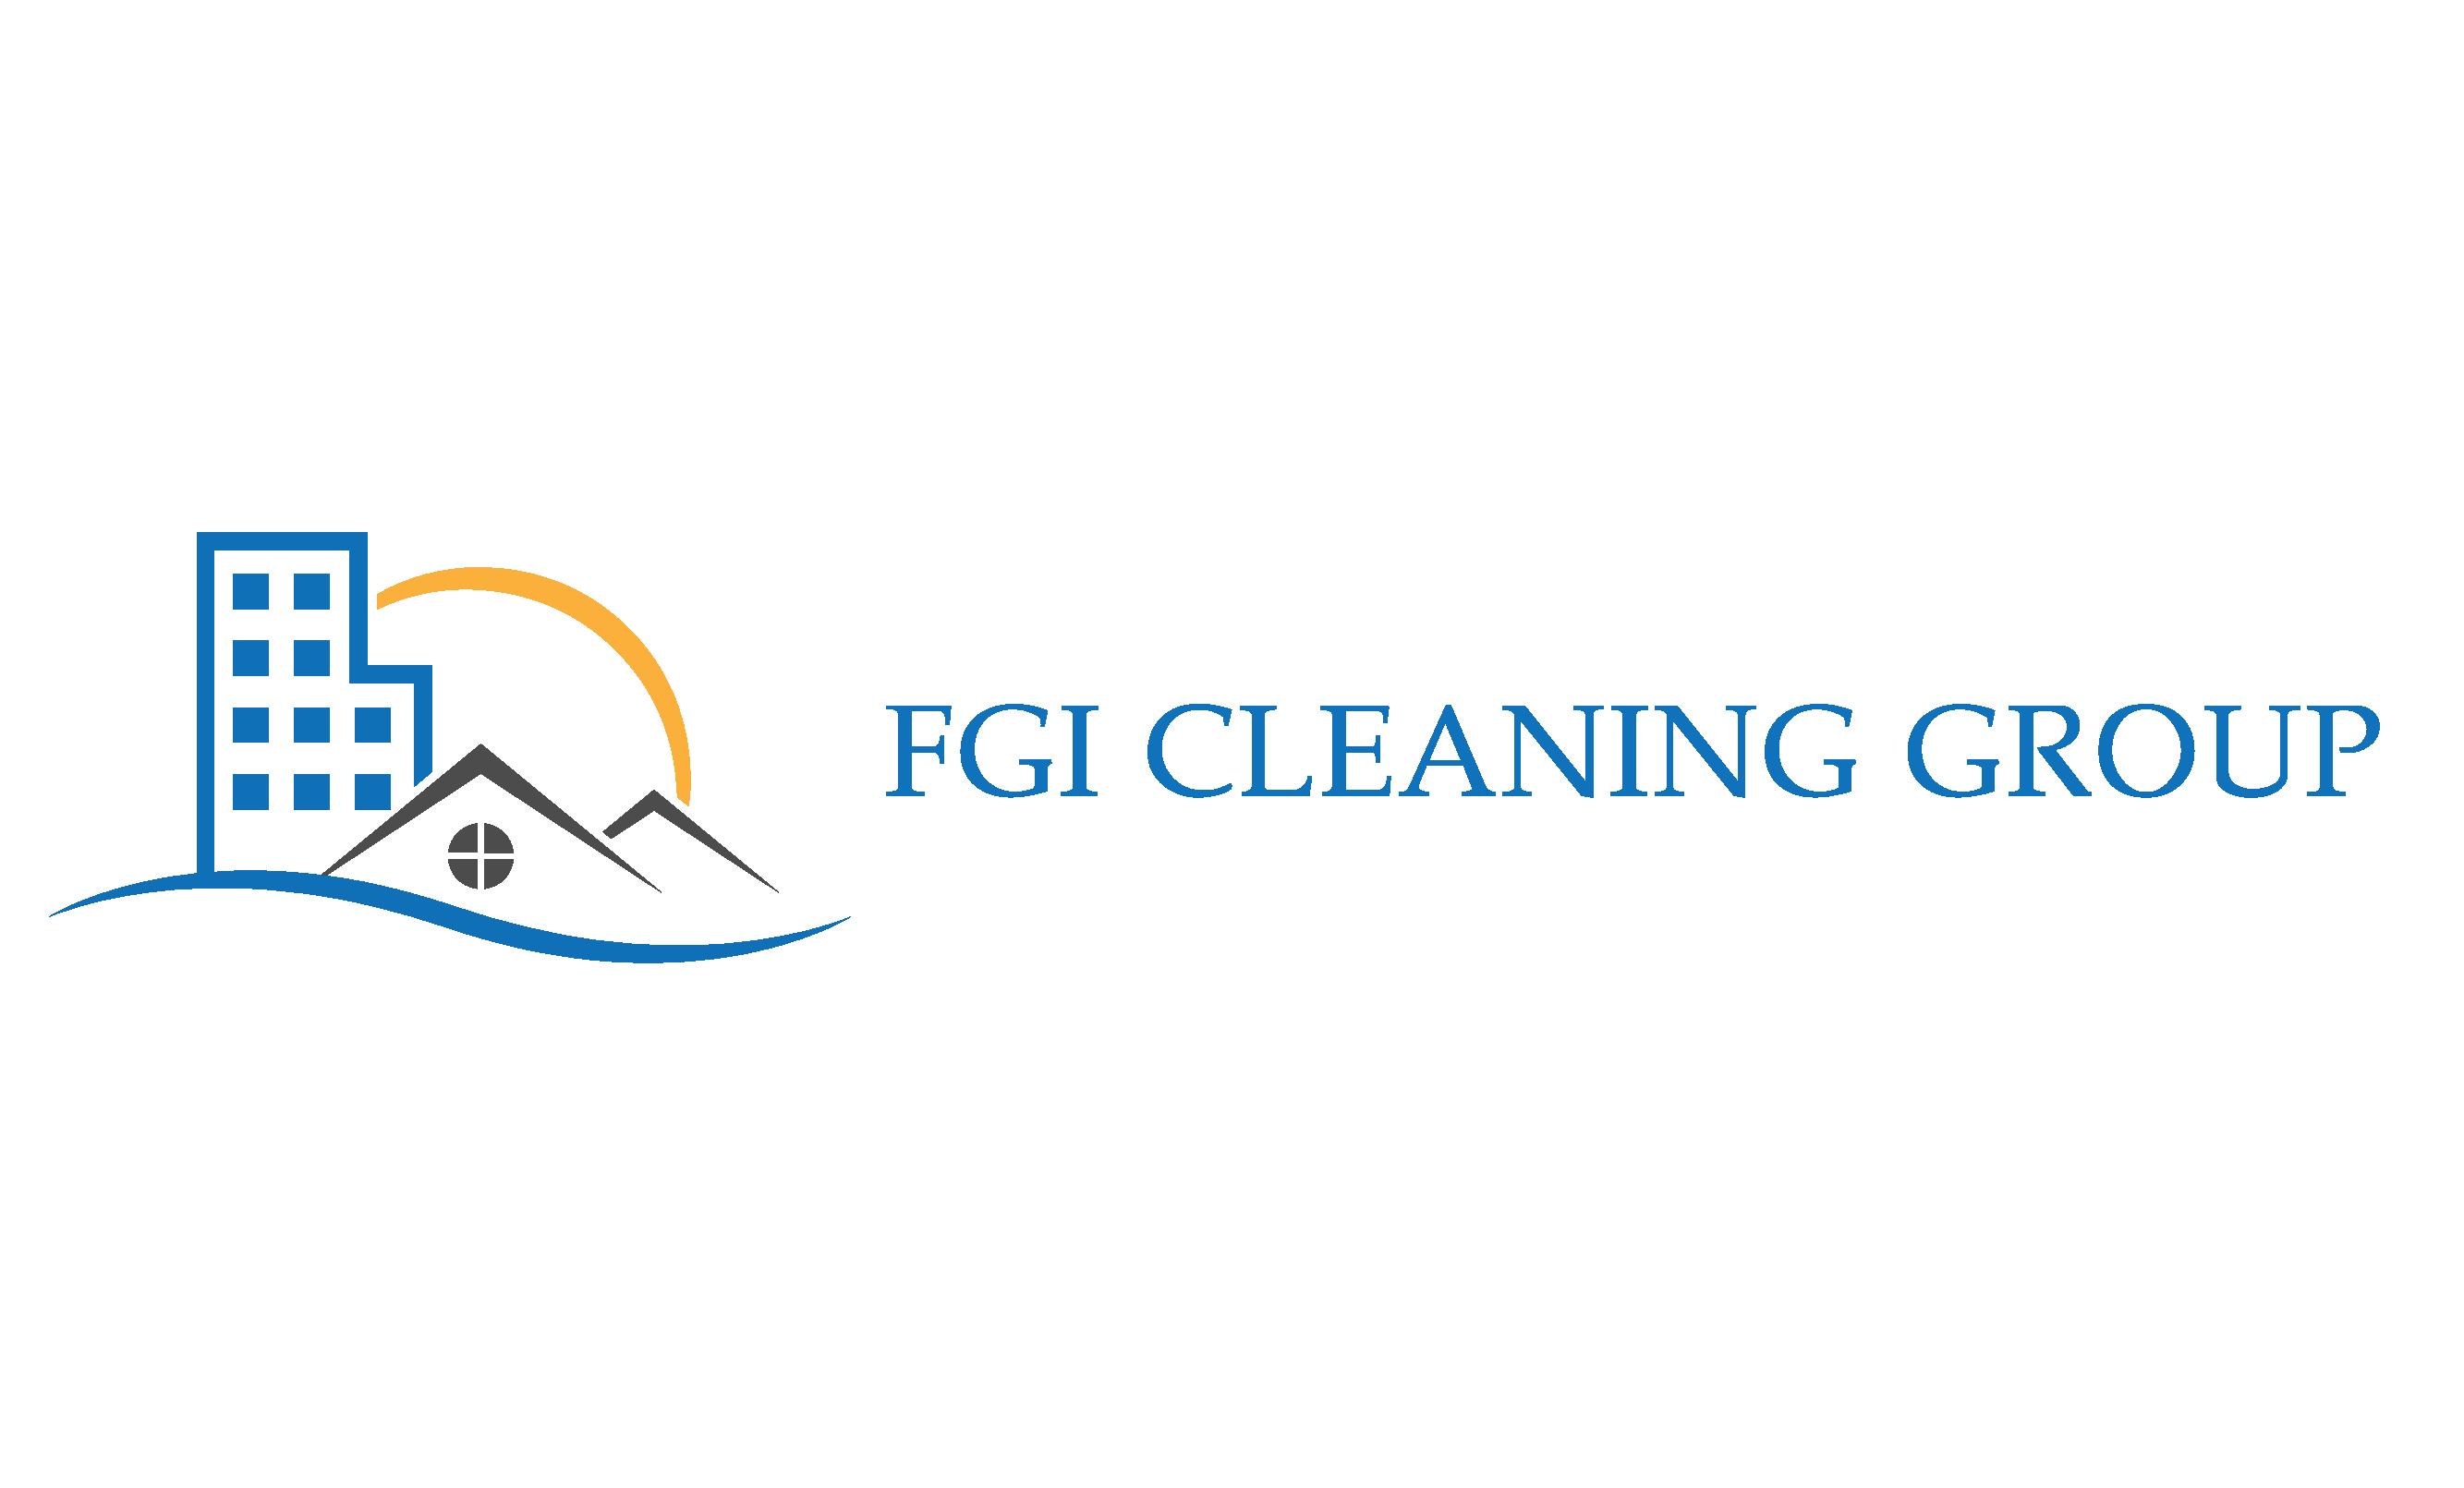 FGI CLEANING GROUP INC